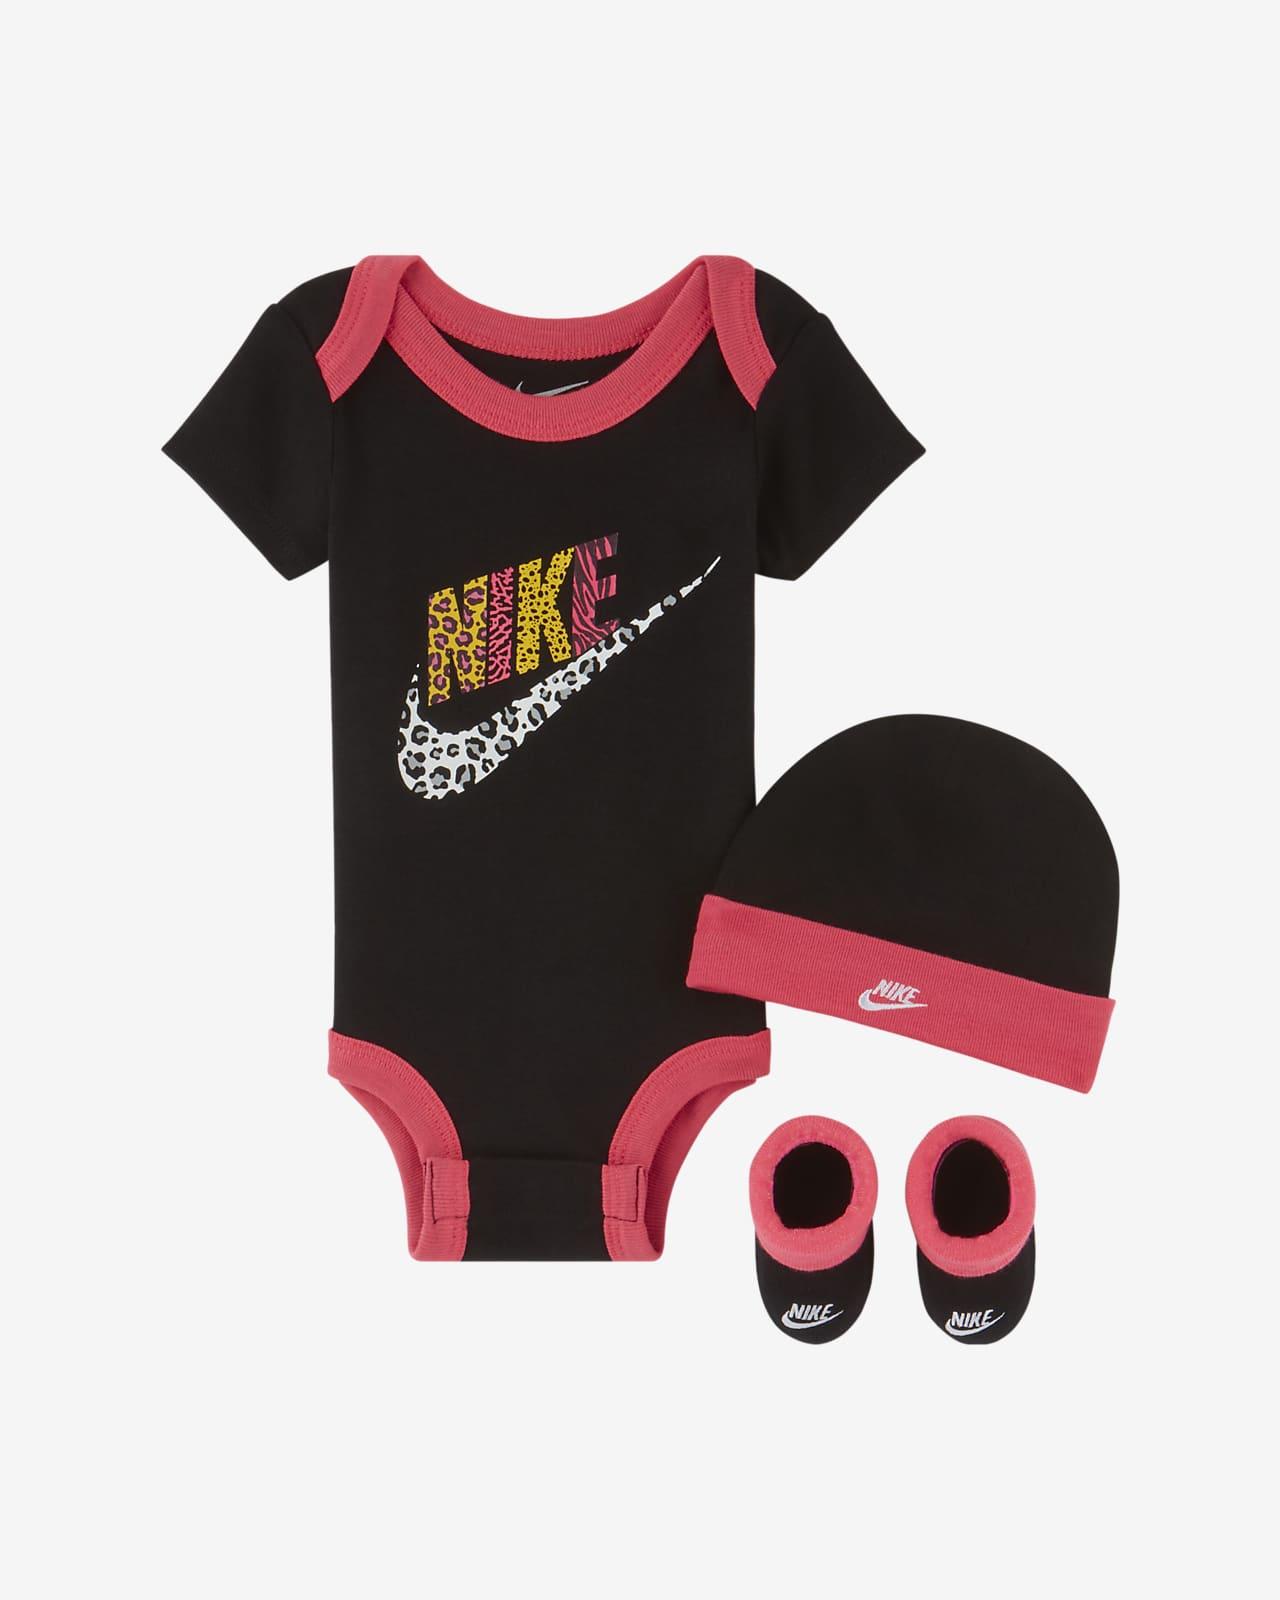 Completo in 3 pezzi Nike - Neonati (12-24 mesi)